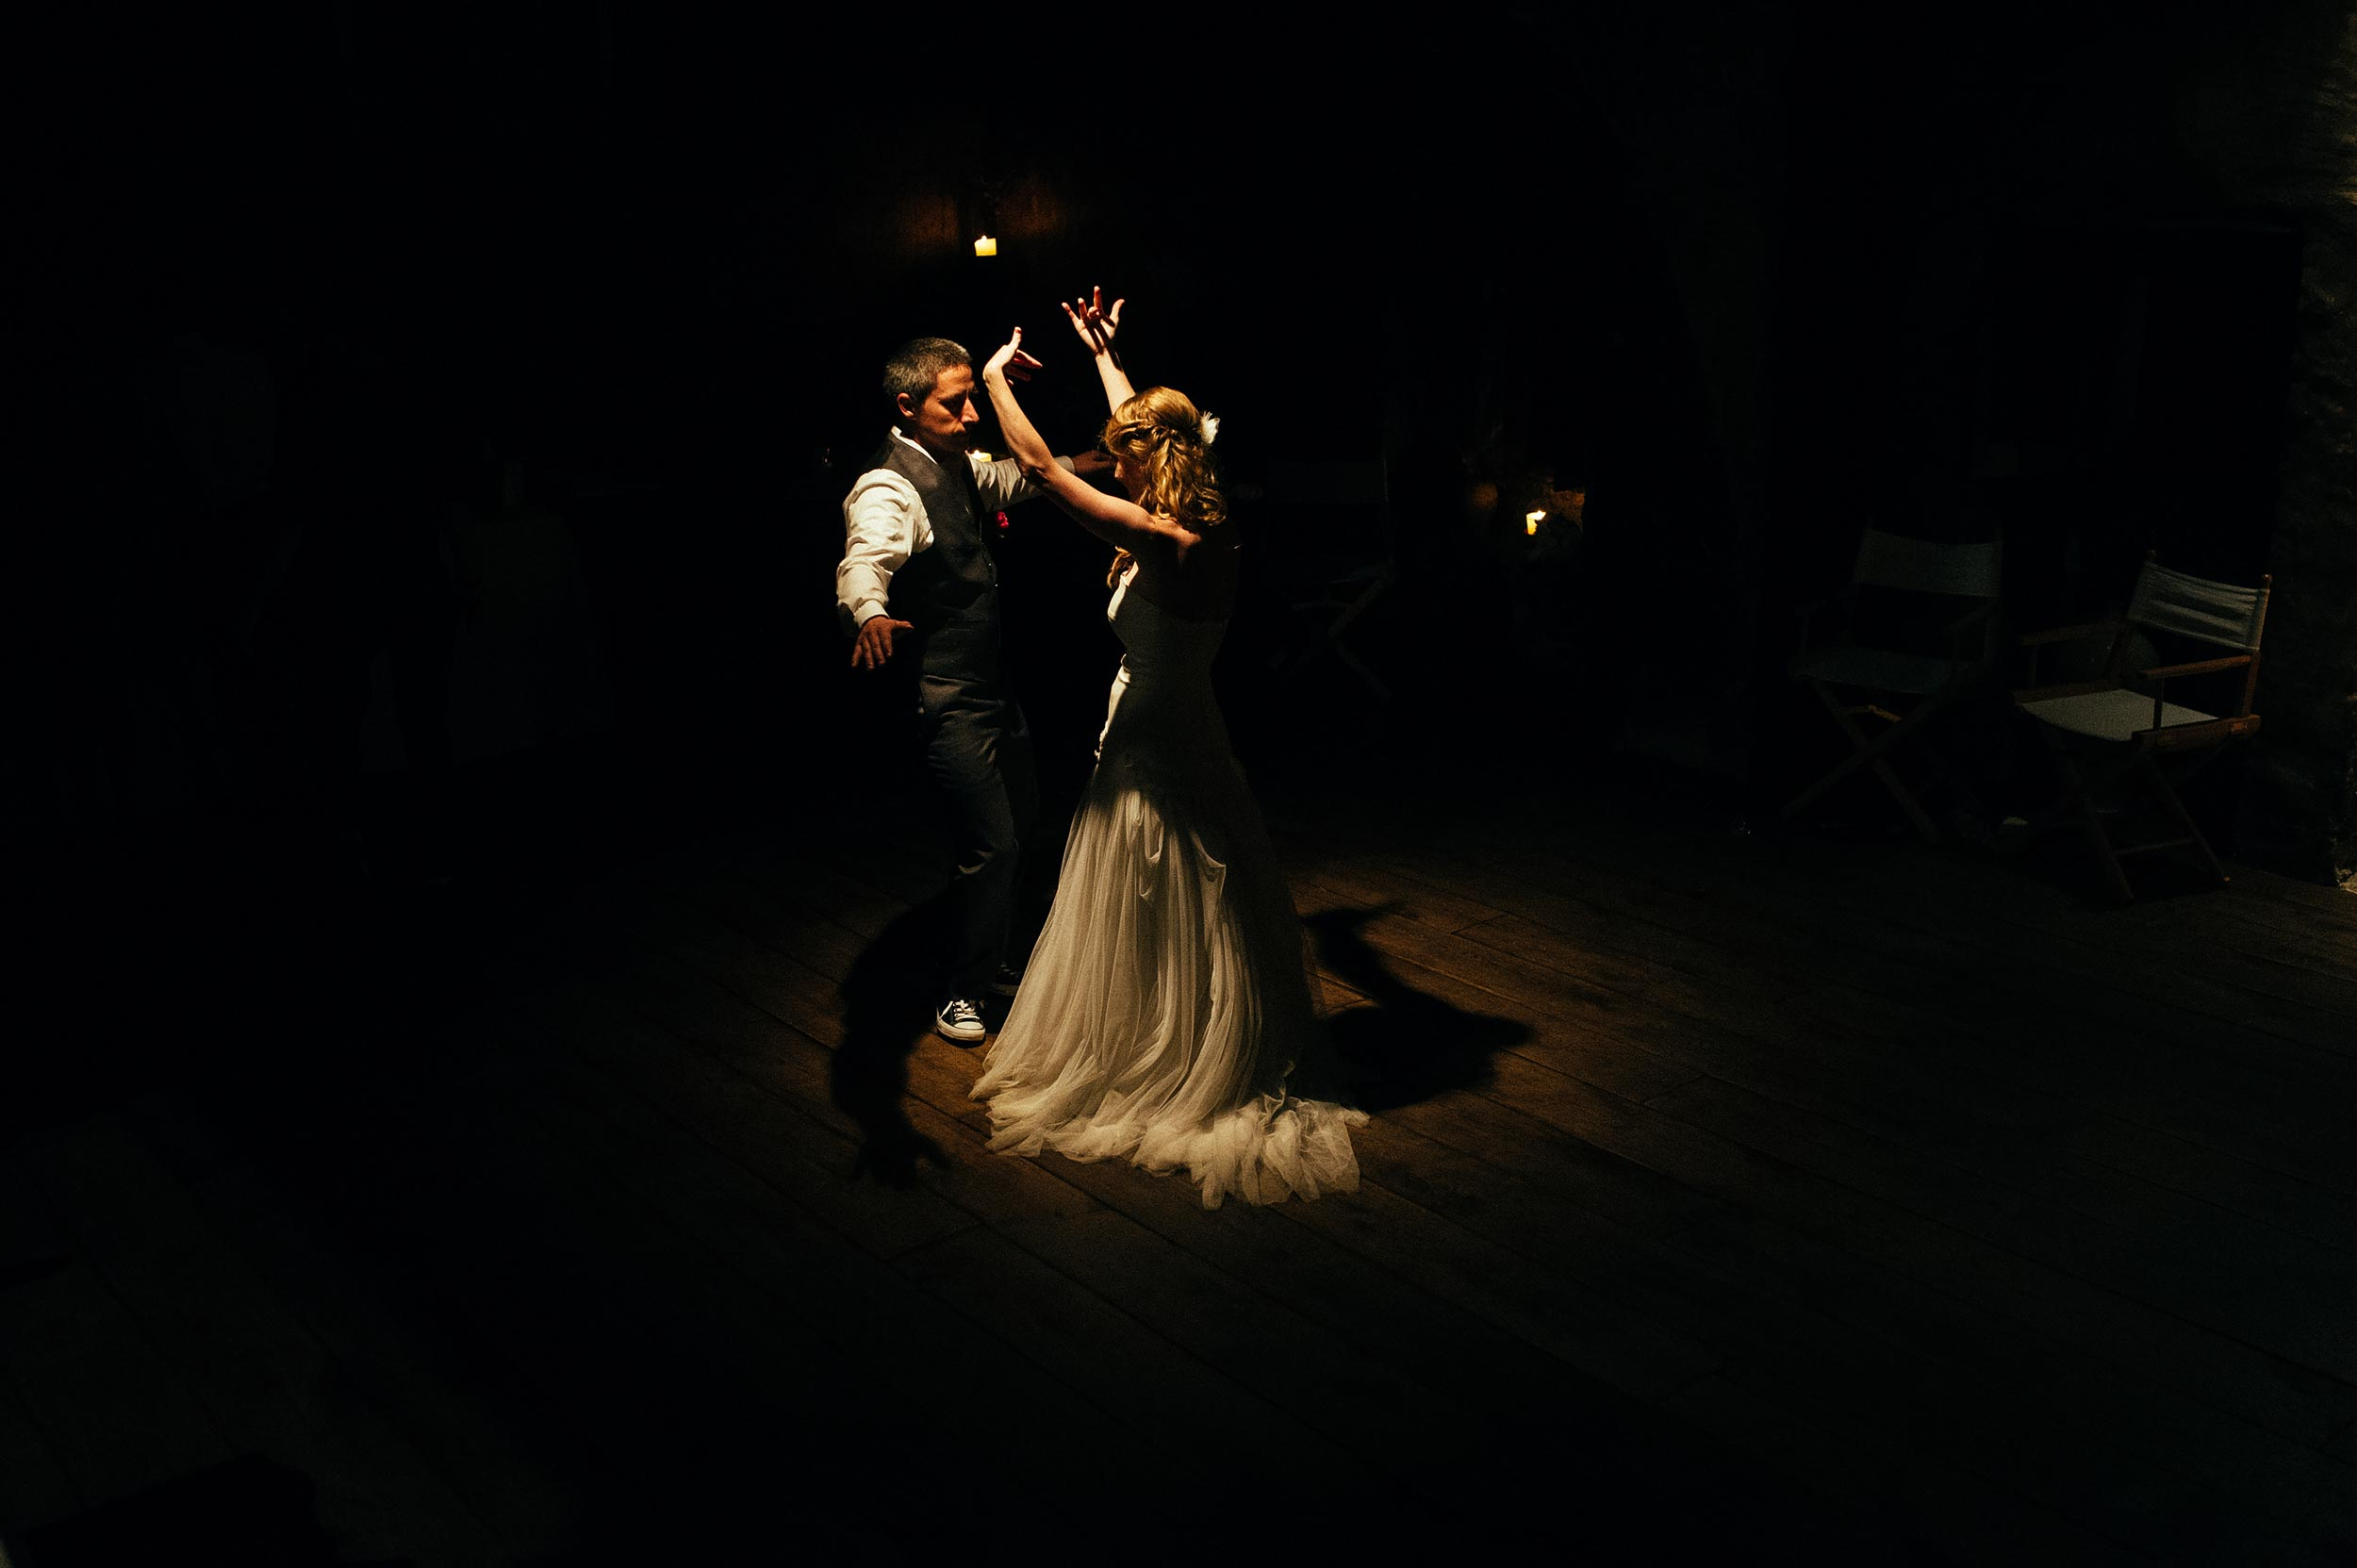 2014-Shelby-Jocelyn-Santo-Stefano-Di-Sessanio-Wedding-Photographer-Italy-Alessandro-Avenali-46.jpg